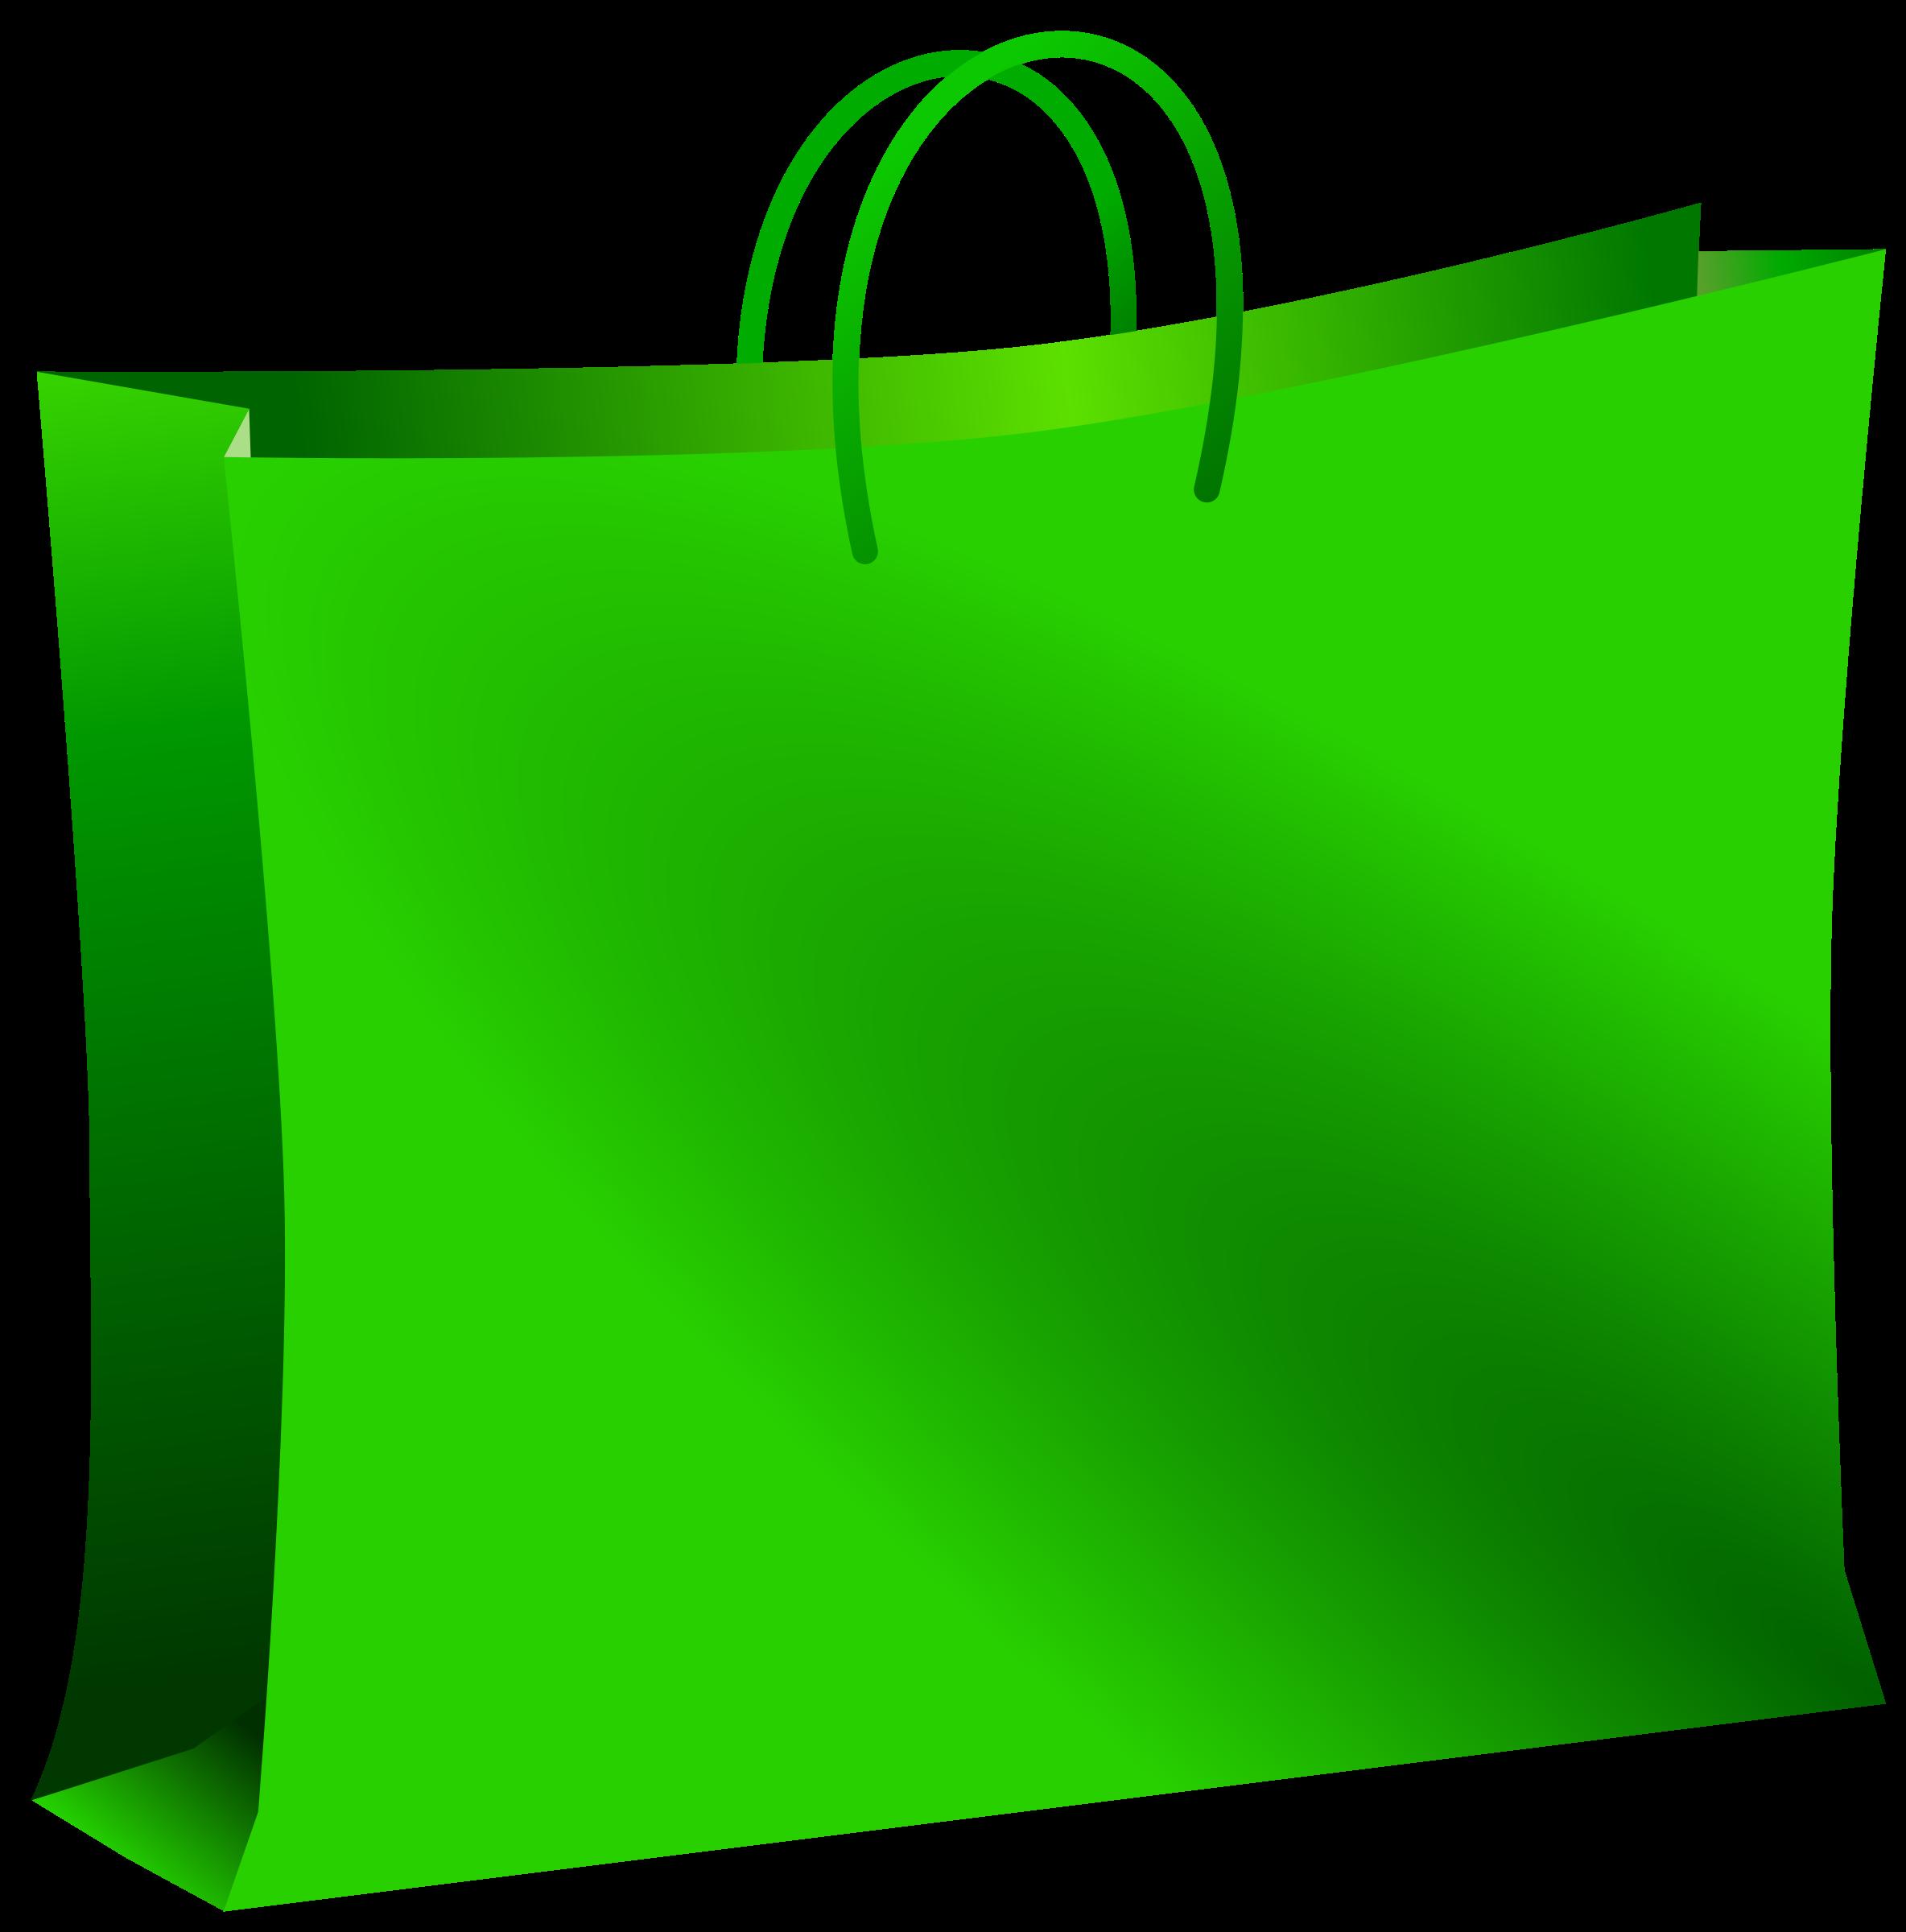 Green bag big image. Luggage clipart holiday